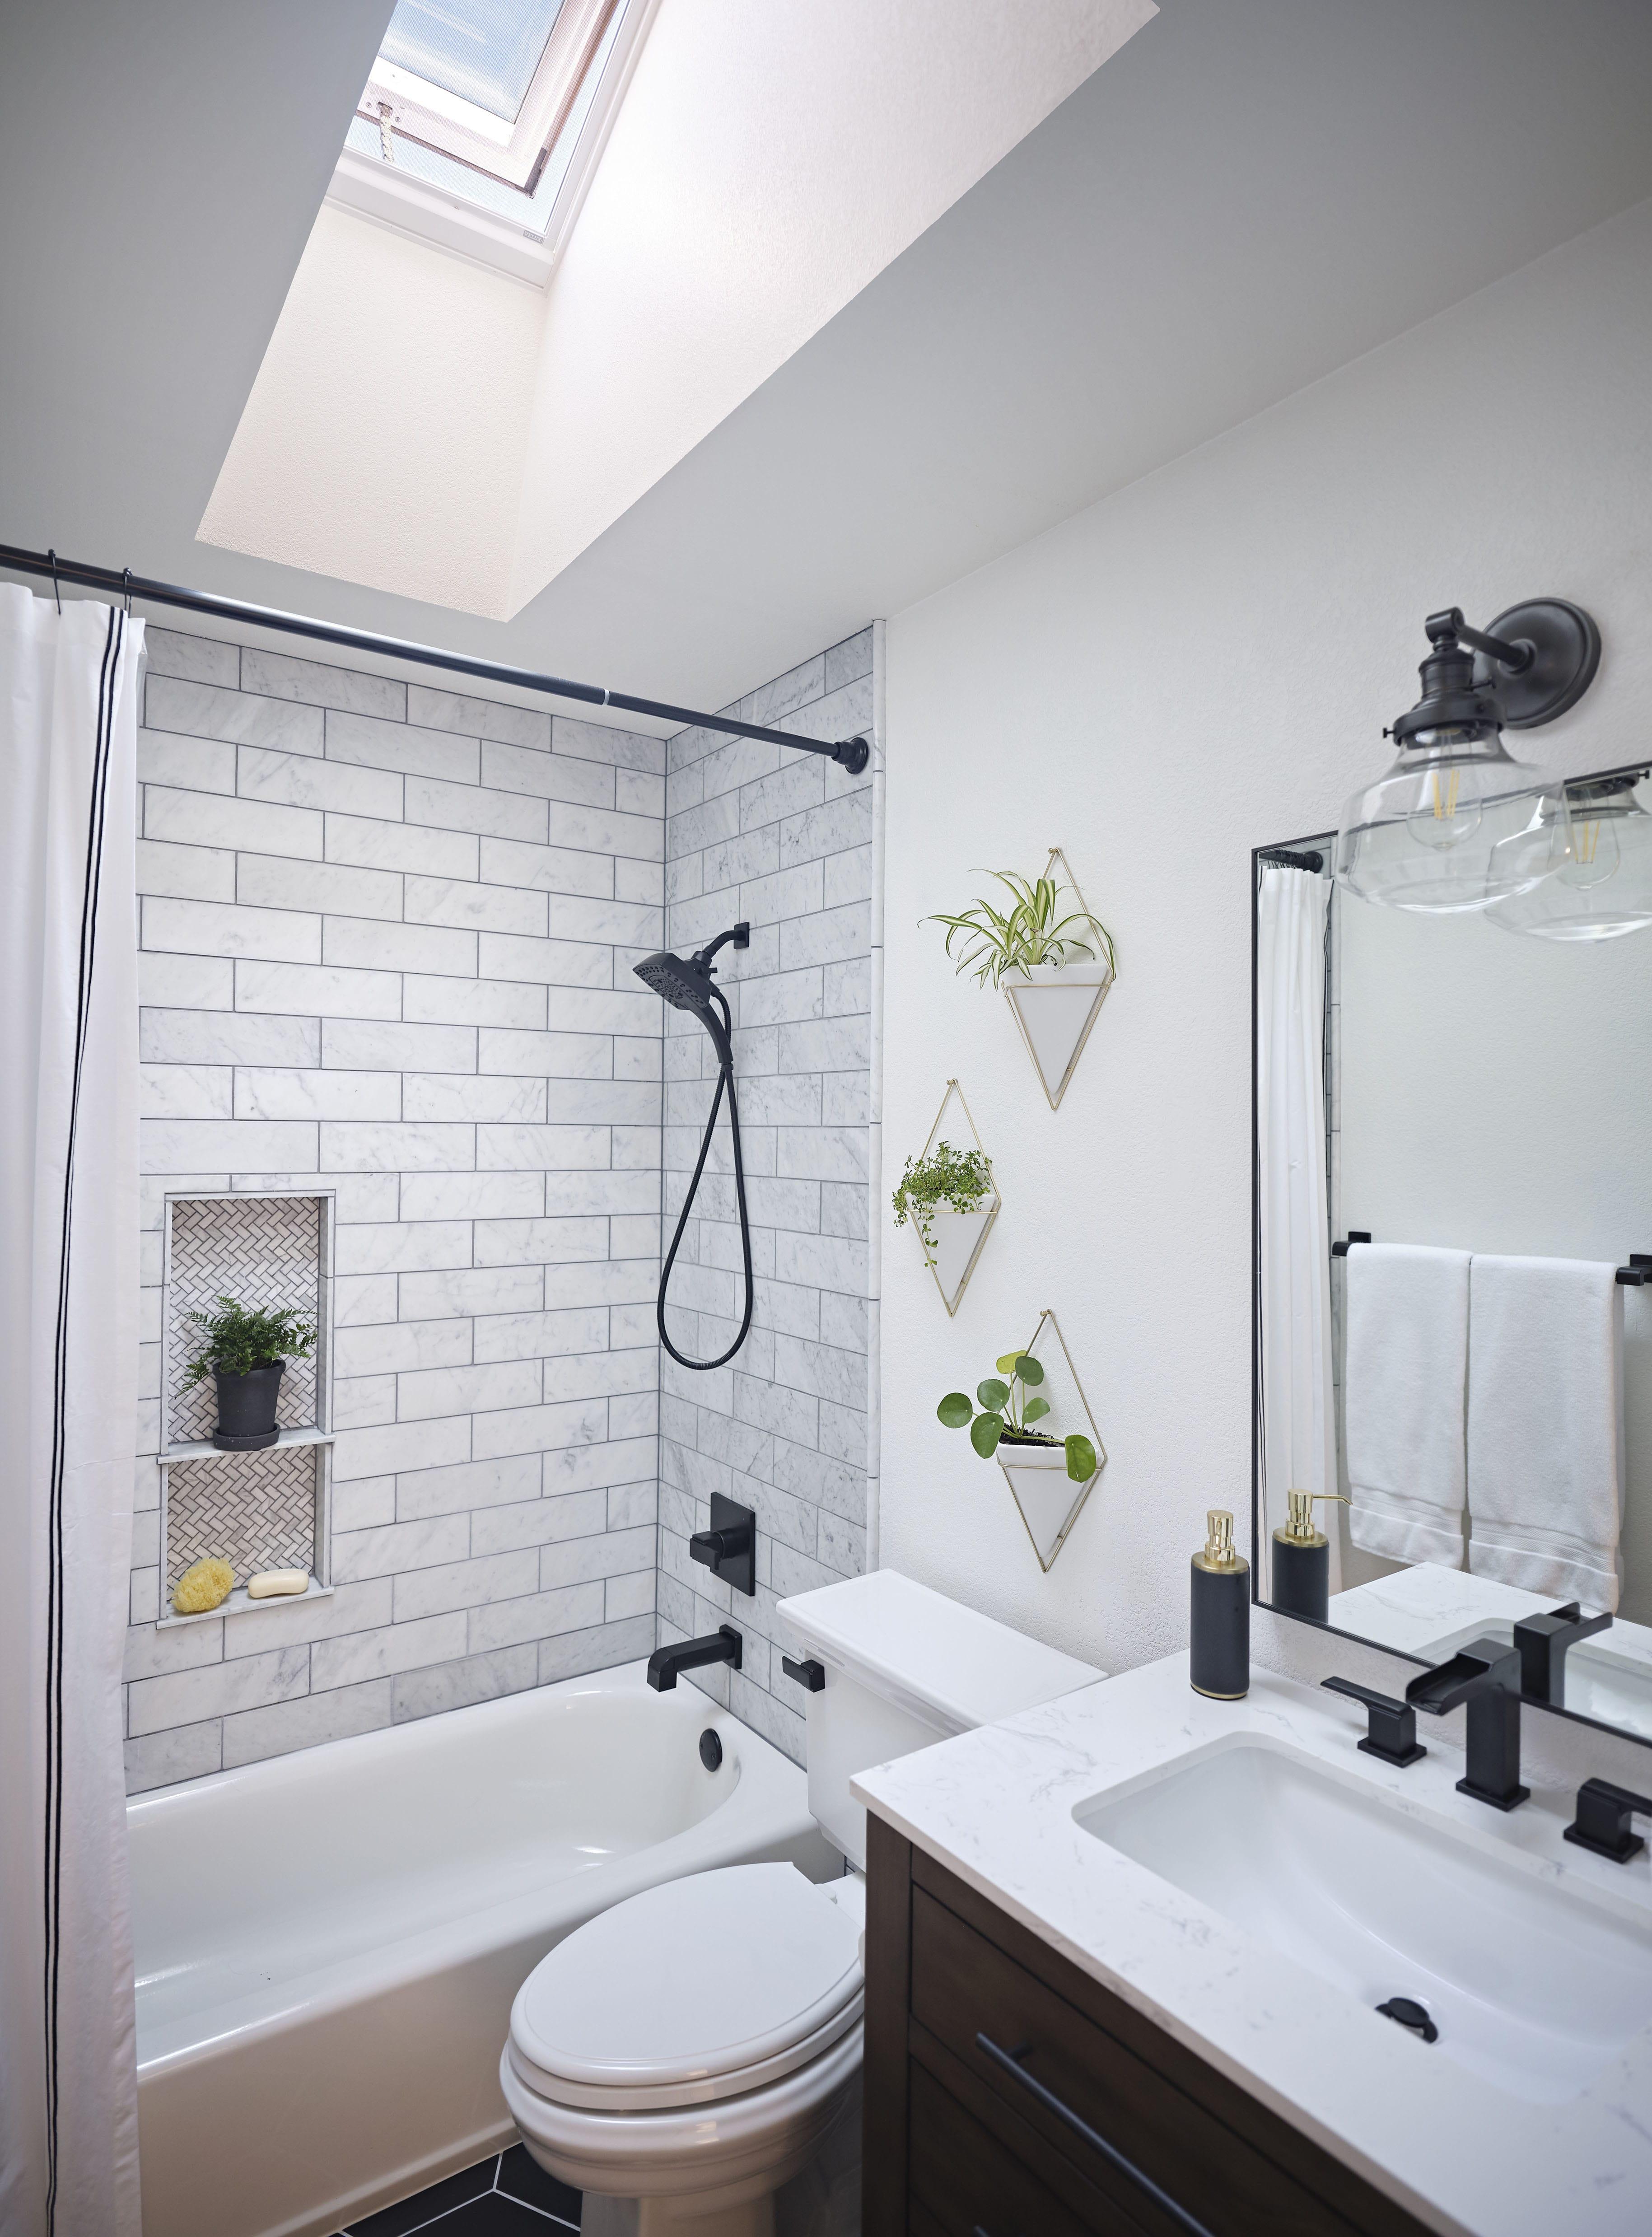 black-and-white-skylight-bathroom-feat.jpg#asset:4484